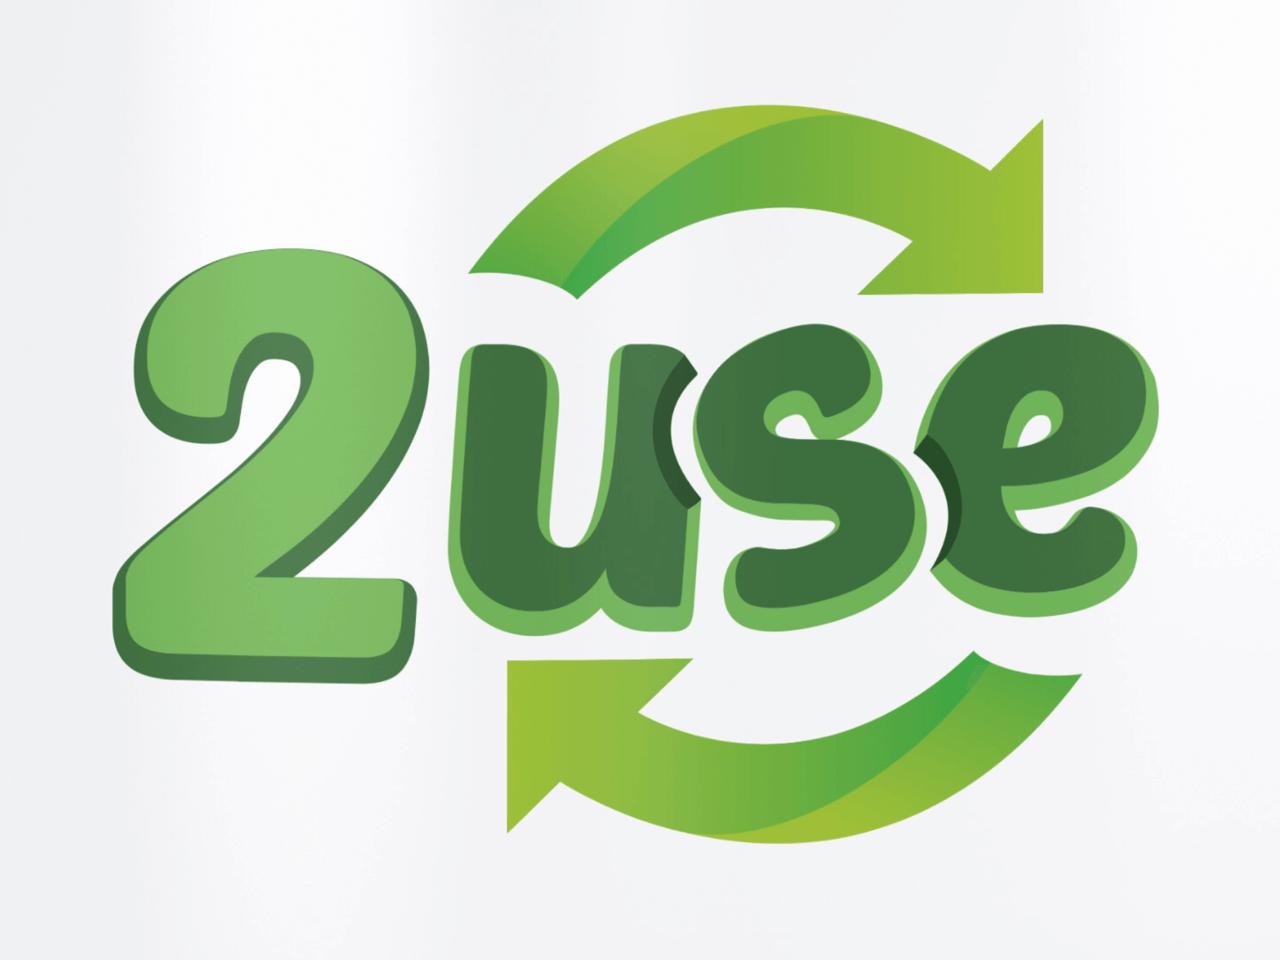 2 Use